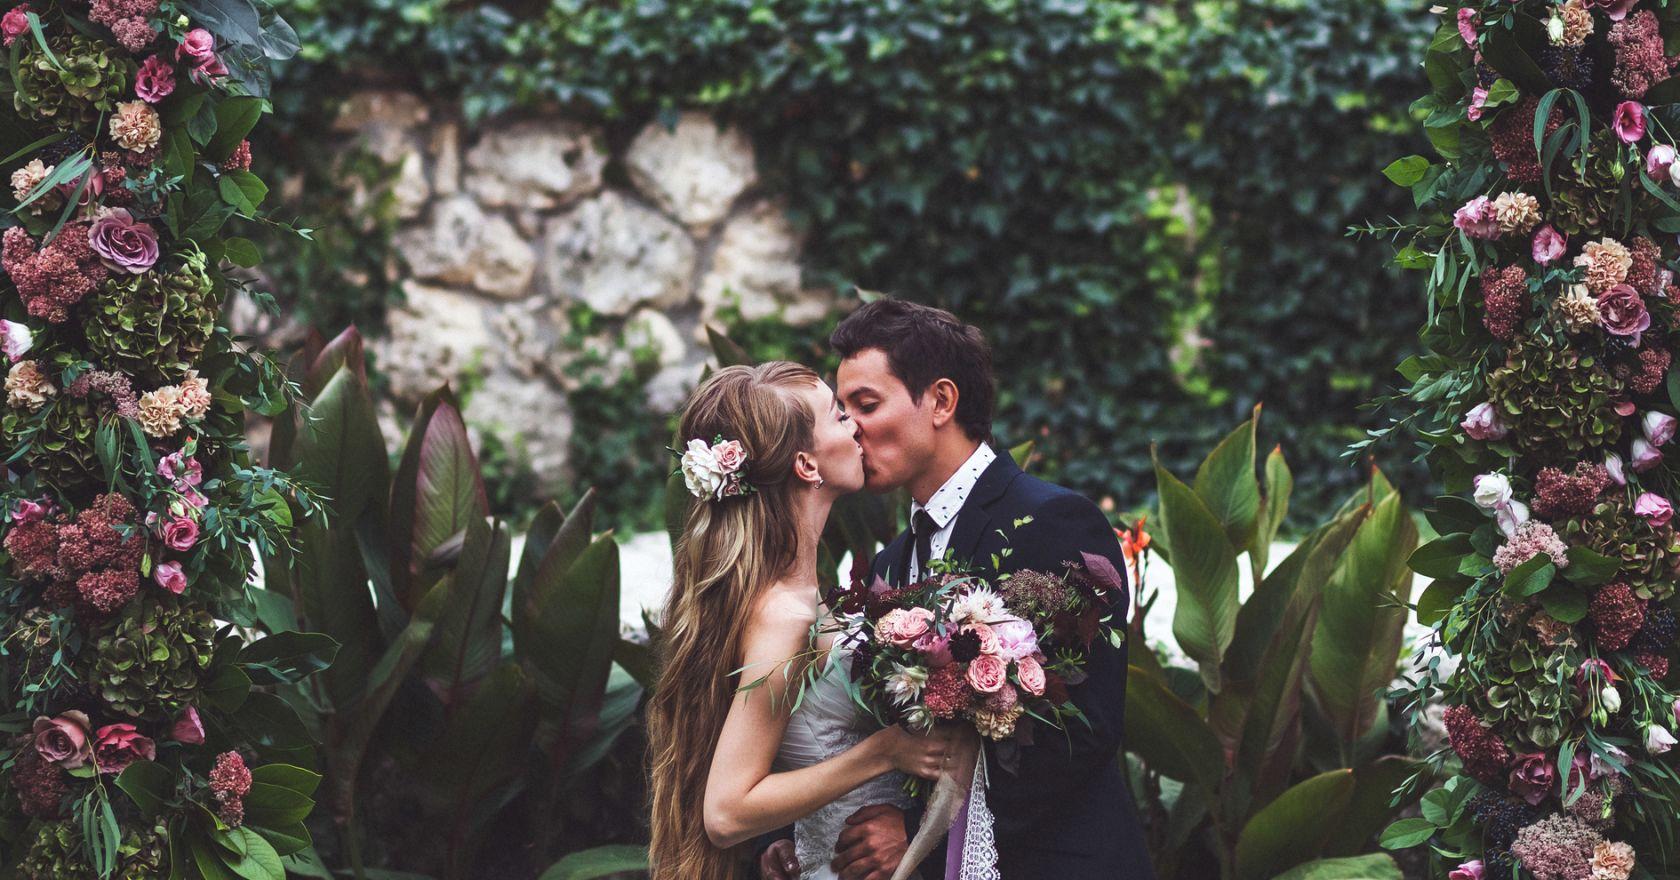 Wedding Day Activity Books For Children x 5 Beautiful Botanical Beautiful